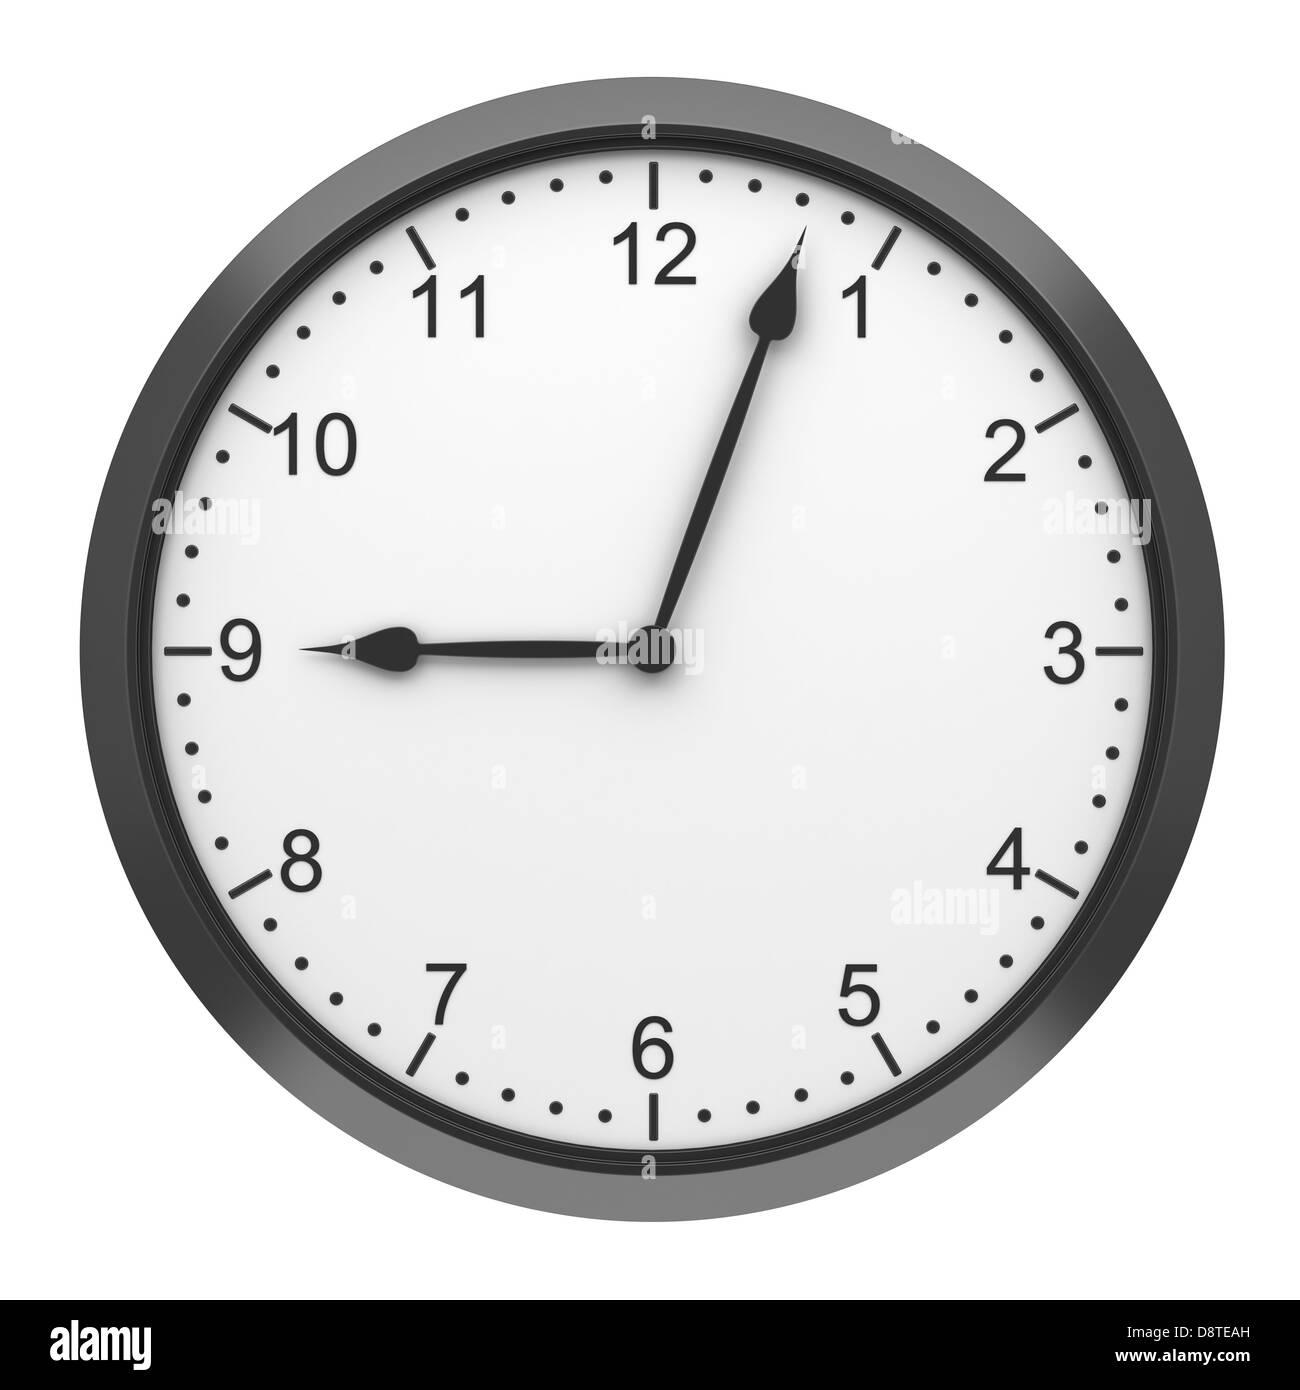 Horloge murale ronde noire isolated on white Photo Stock